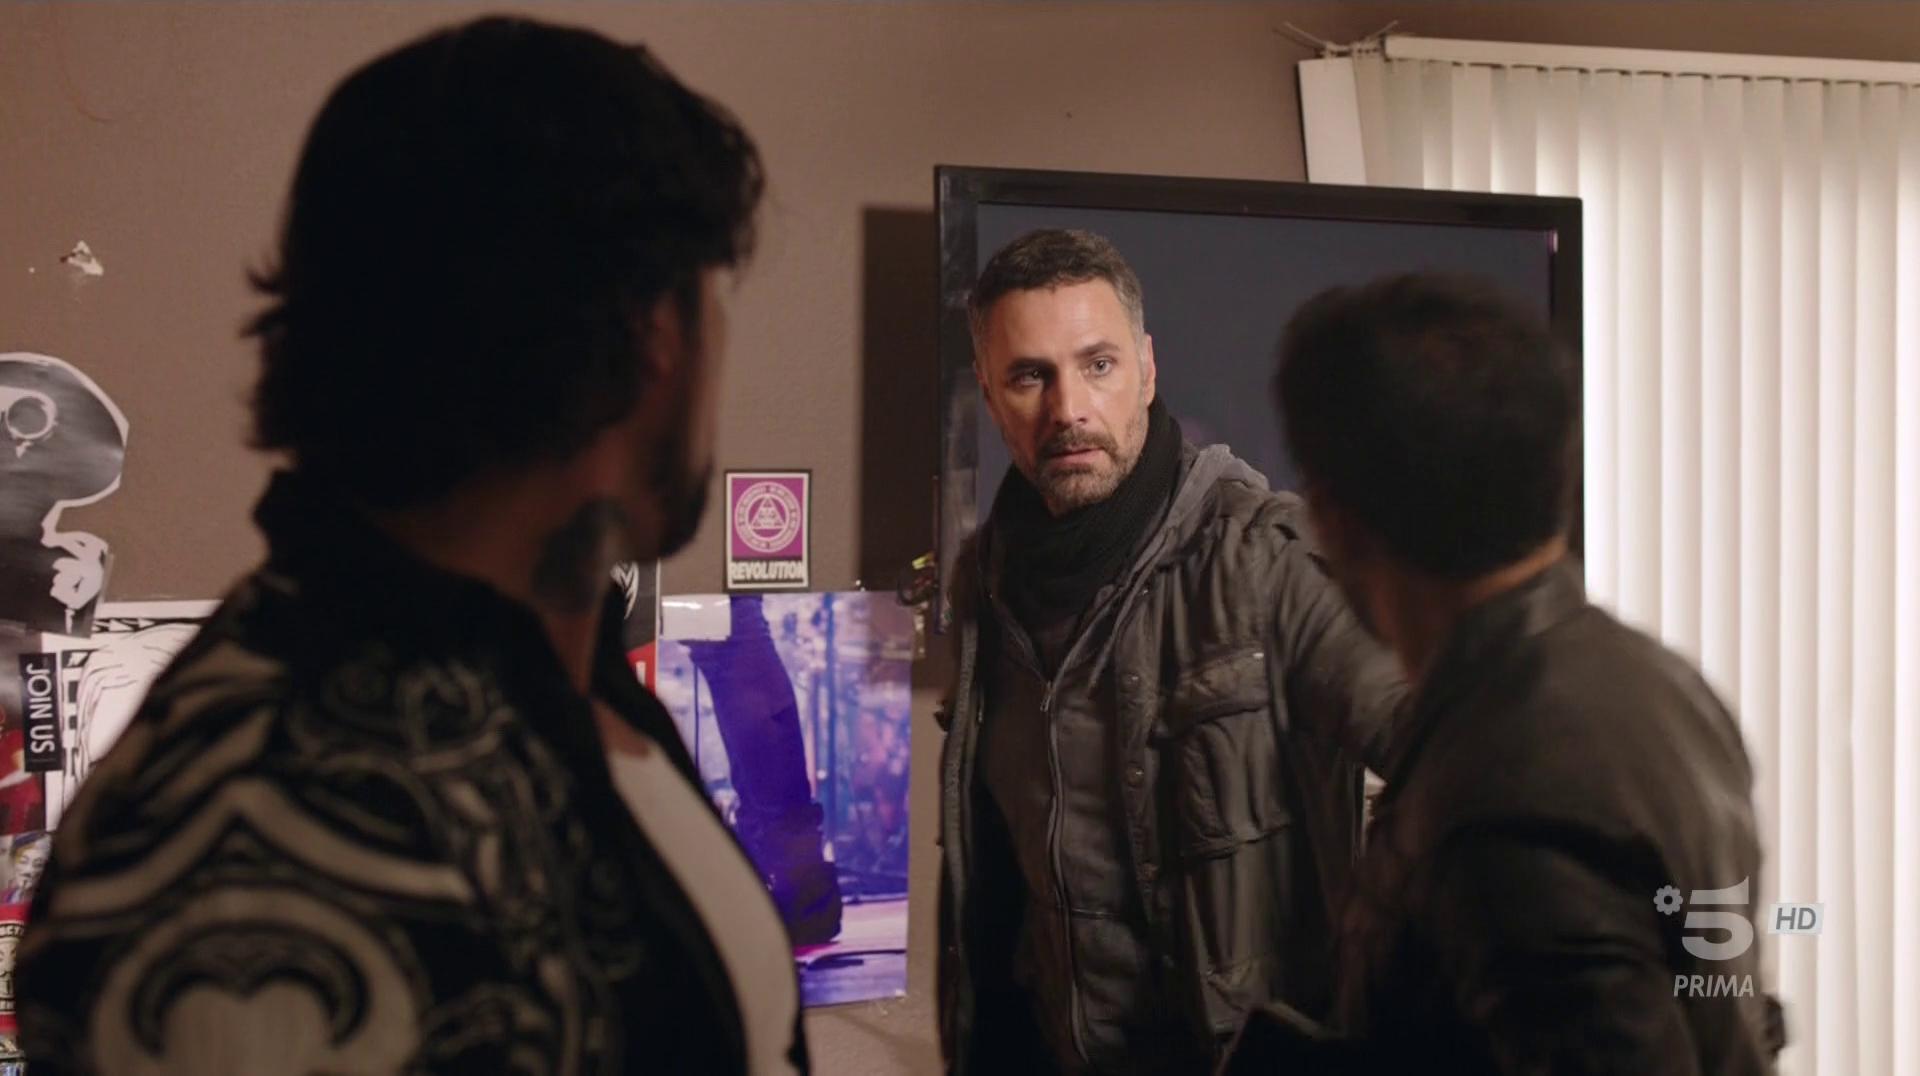 Ultimo - Caccia ai Narcos - MiniSerie (2018) (Completa) HDTV 1080P ITA AC3 x264 mkv Vlcsnap-2018-12-21-15phi04